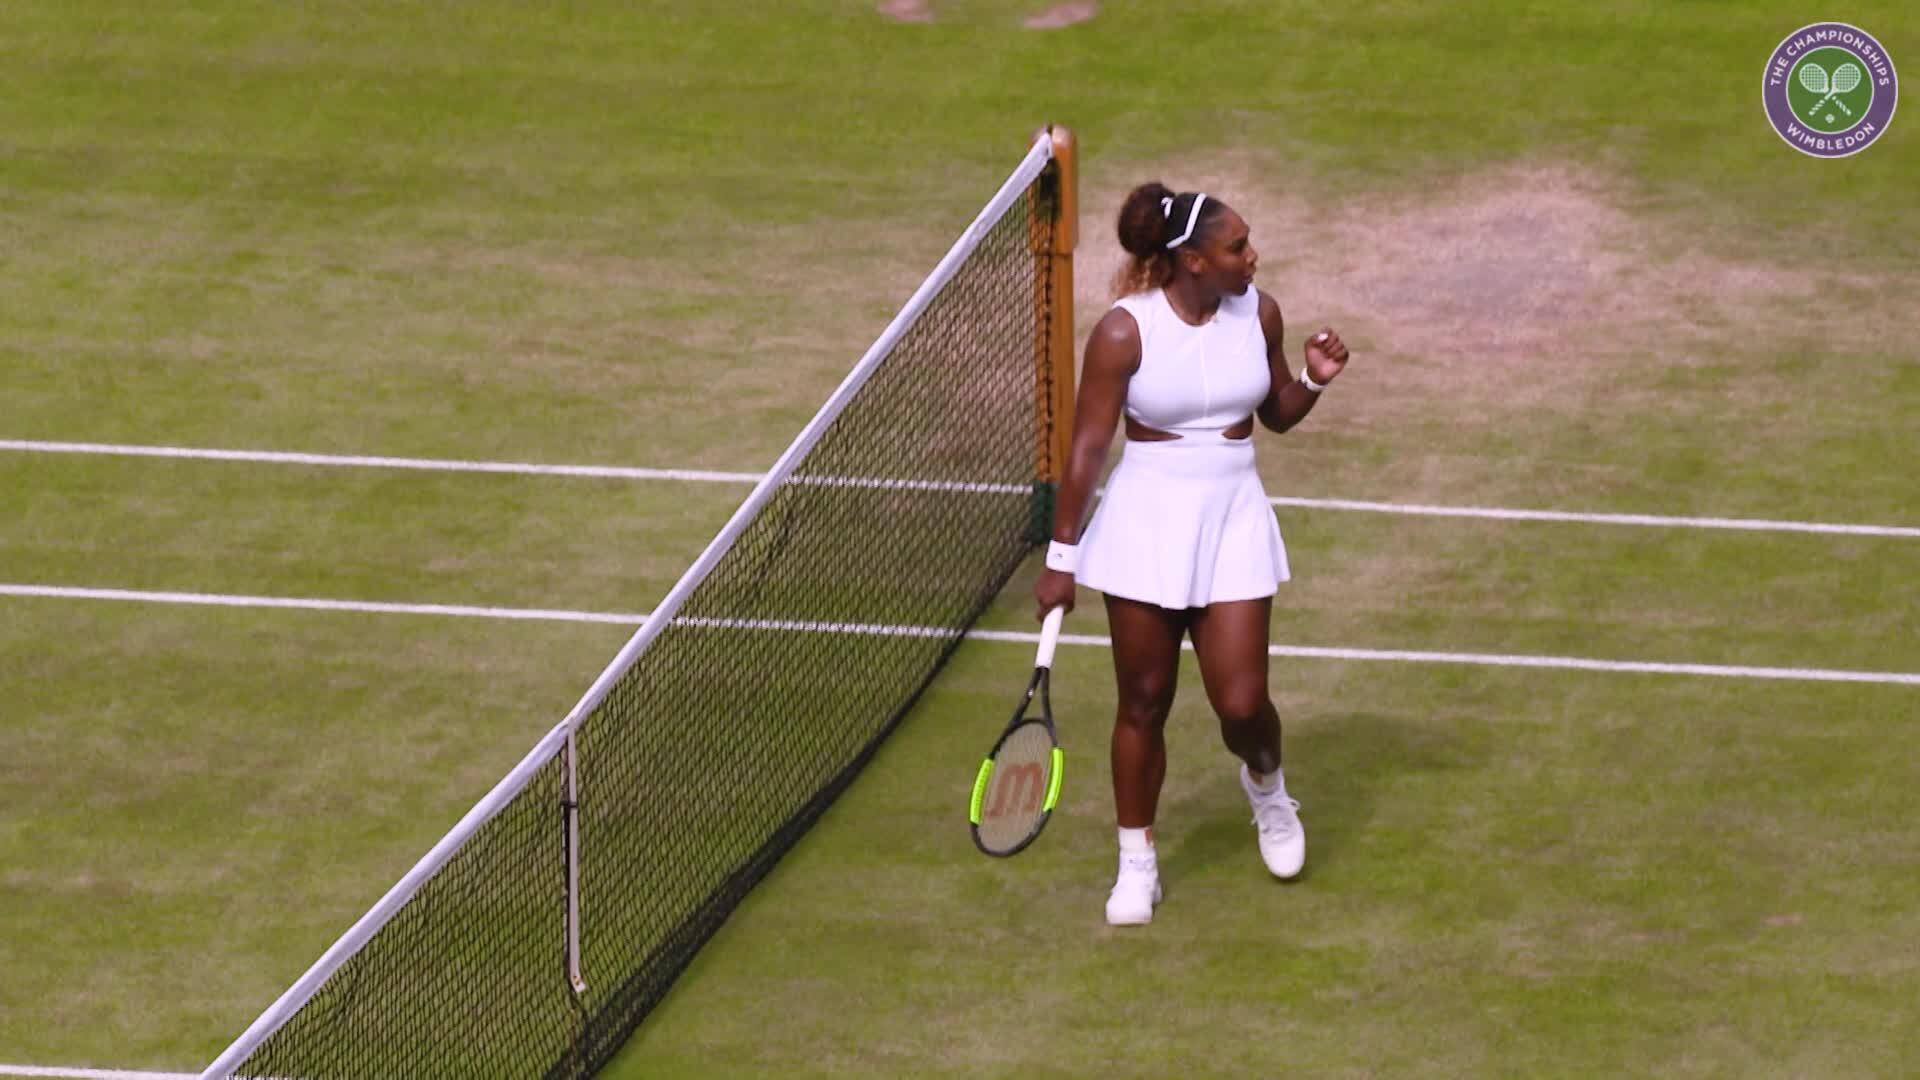 Serena Williams vs Simona Halep: Wimbledon 2019 final start time, odds, TV channel, live stream, head to head